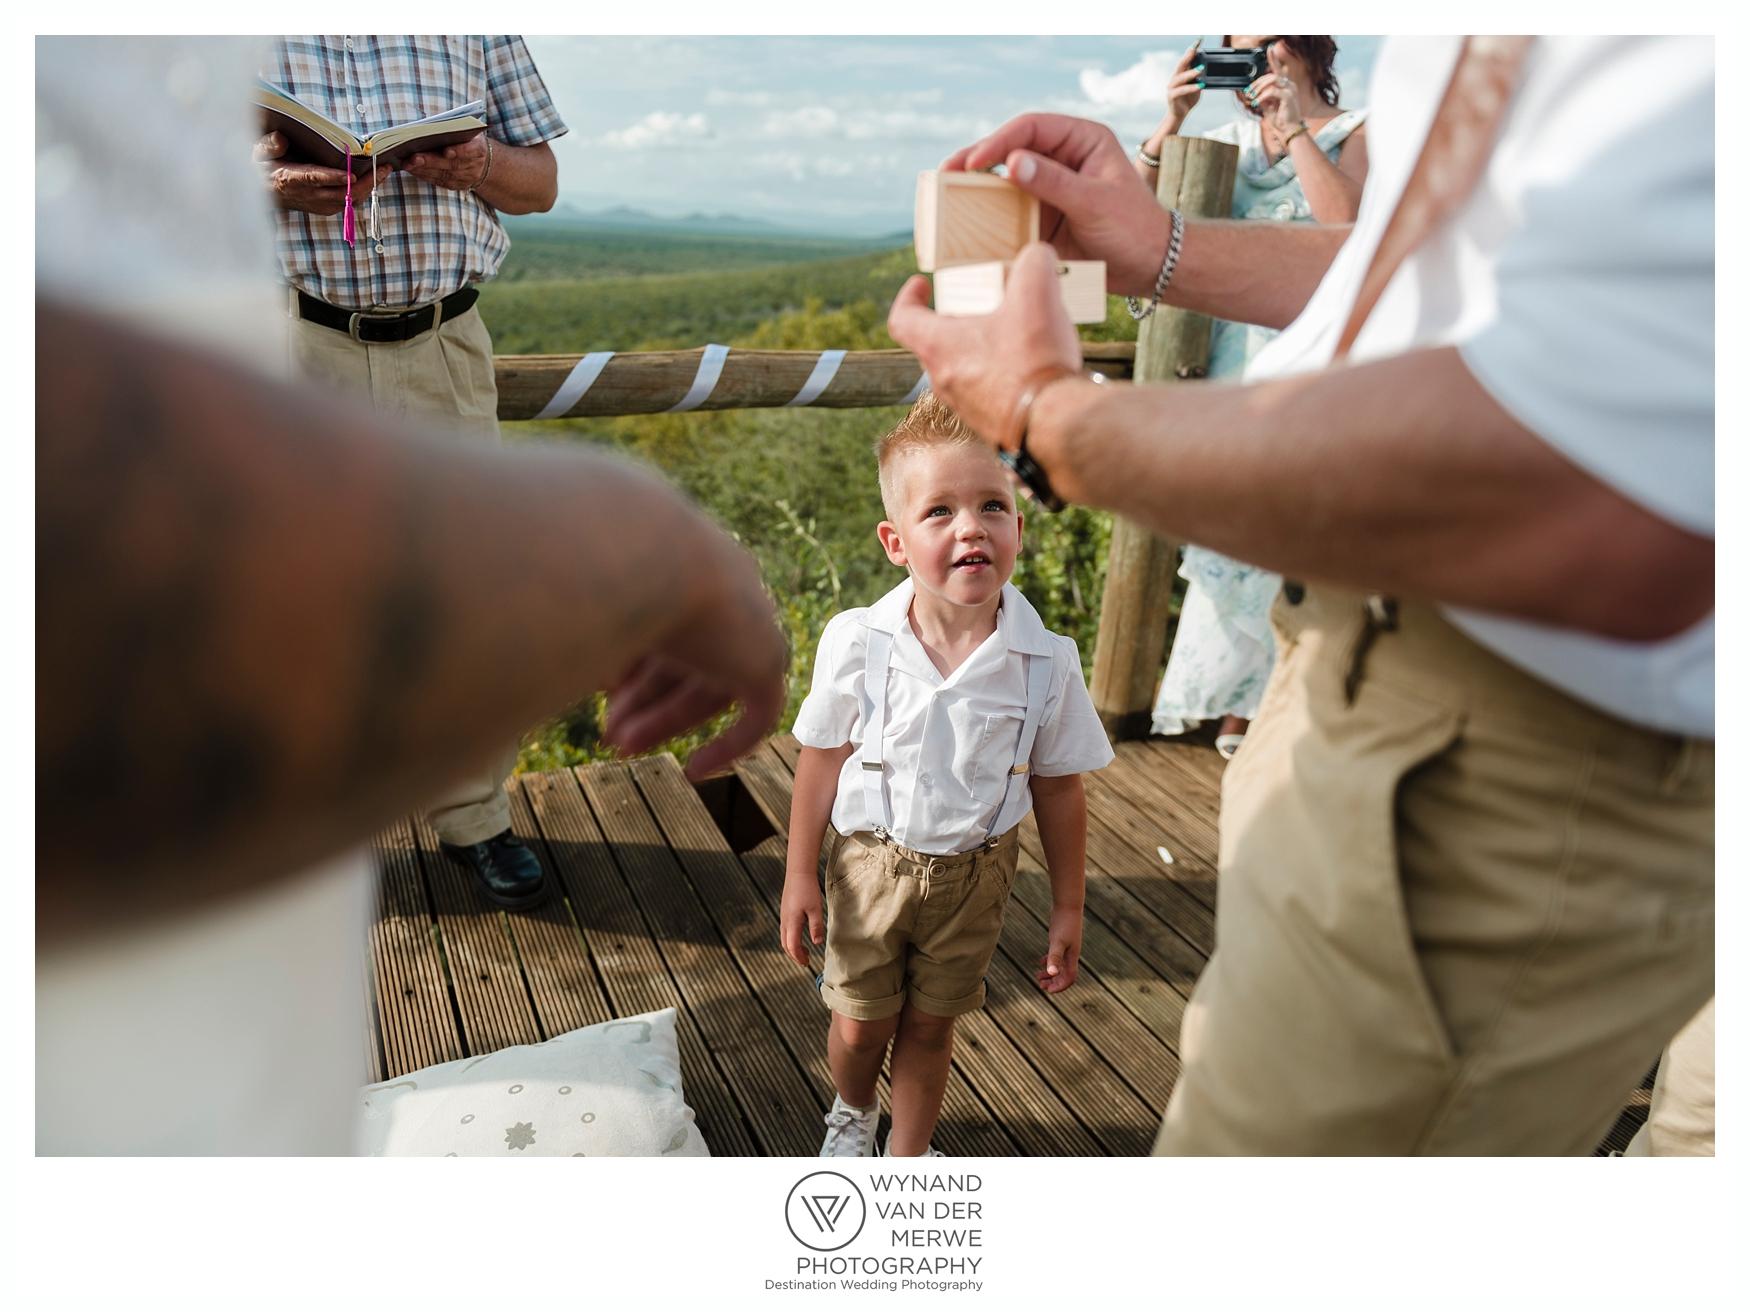 WynandvanderMerwe_weddingphotography_bushveldwedding_northam_bushveld_limpopowedding_limpopo_southafrica-102.jpg